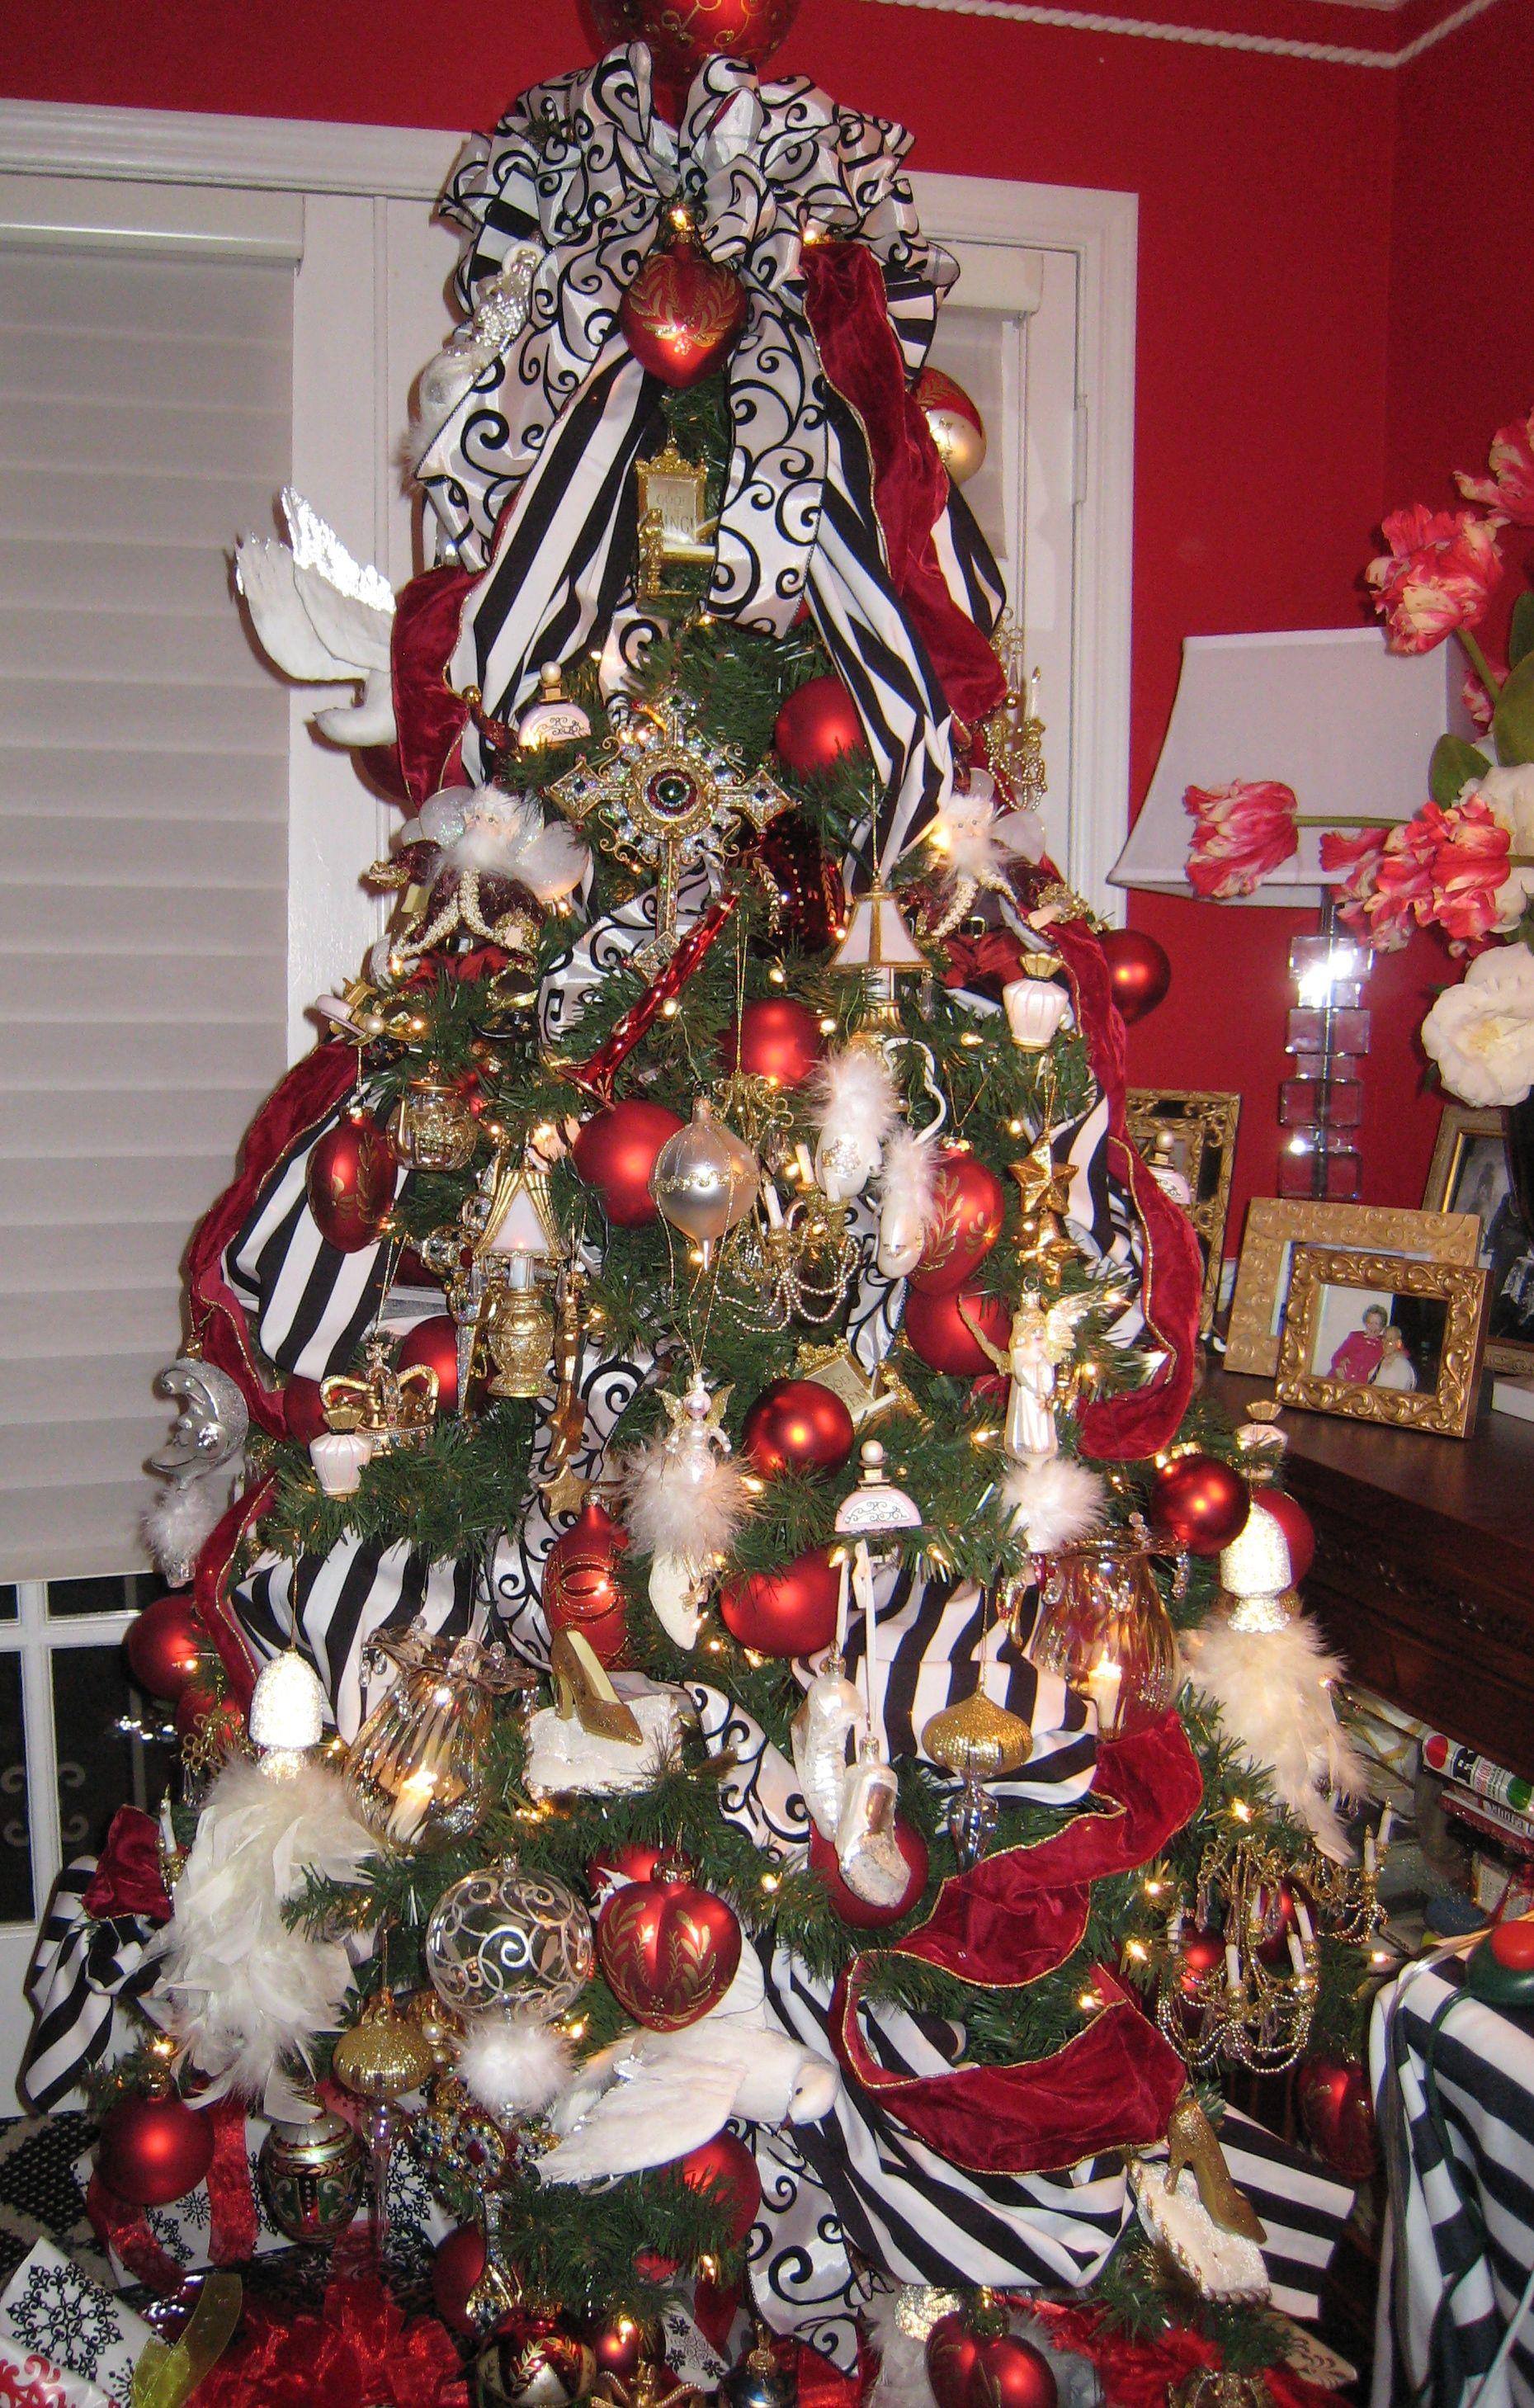 The Natural Cheetah Print Room Ideas Home Decor Wall Idolza Black Christmas Decorations Elegant Christmas Trees Elegant Christmas Tree Decorations